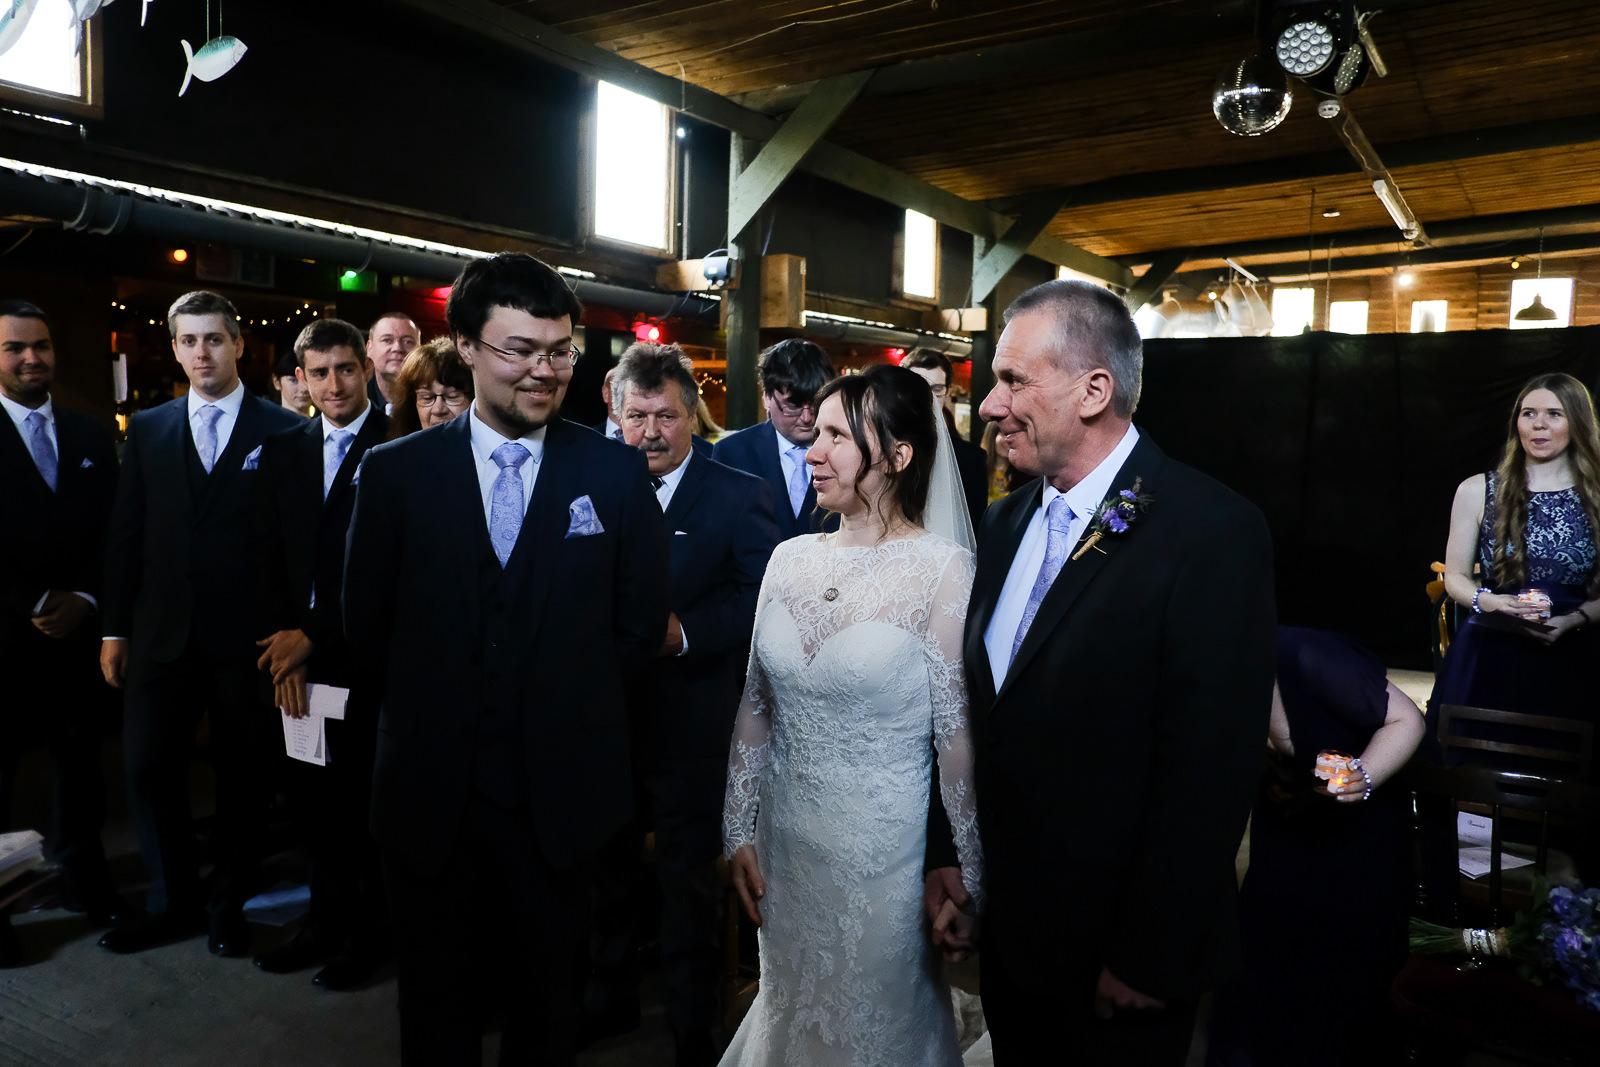 Retorrick Mill Newquay wedding 040.jpg